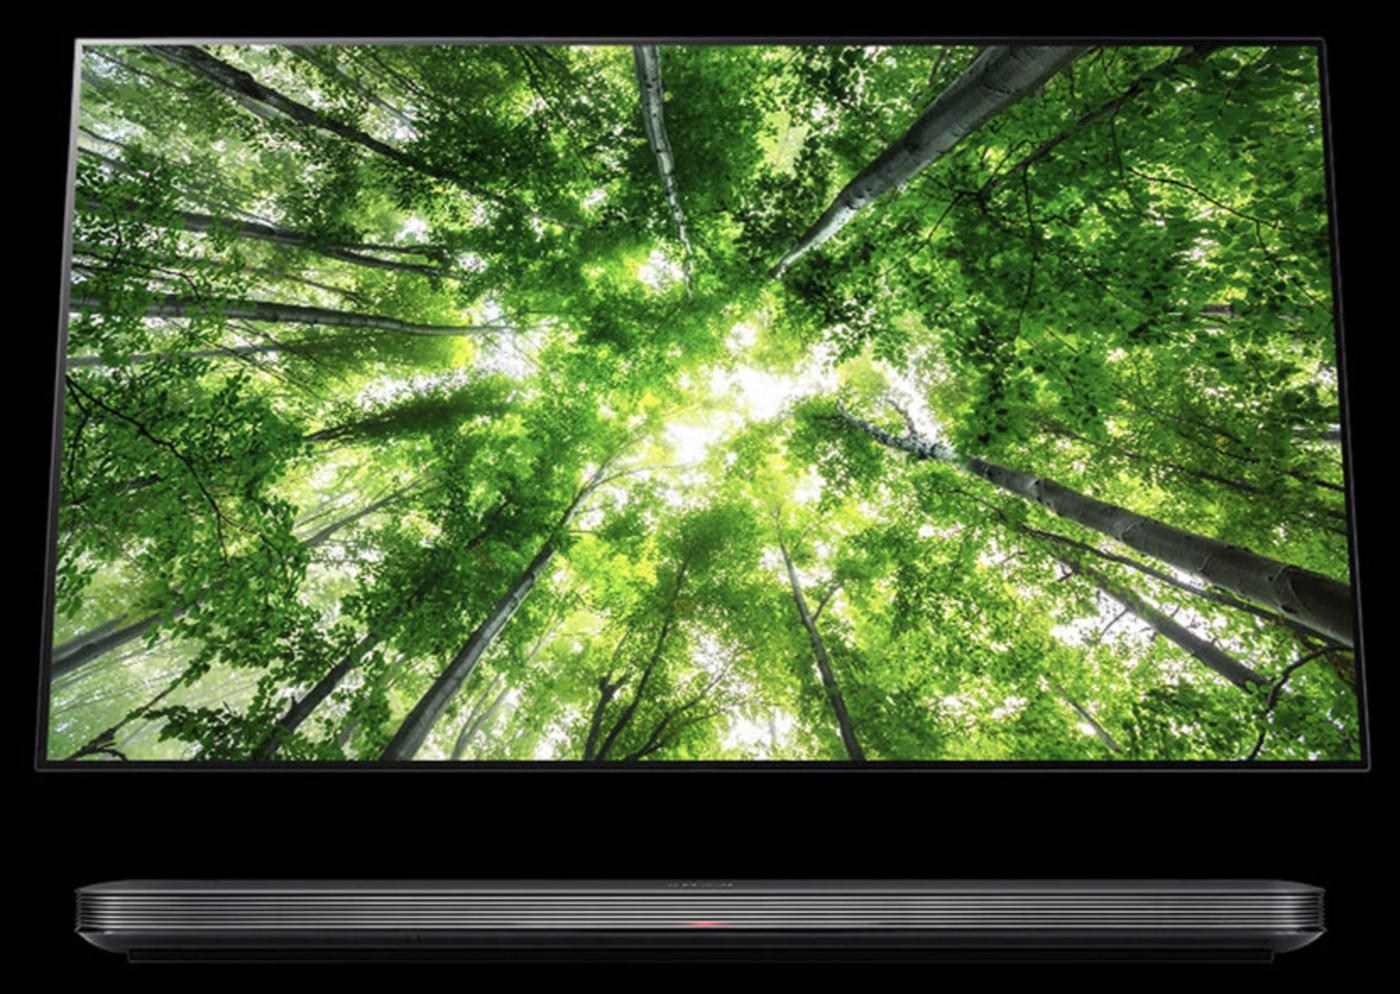 LG's premium 2018 OLED TVs have lower starting prices than